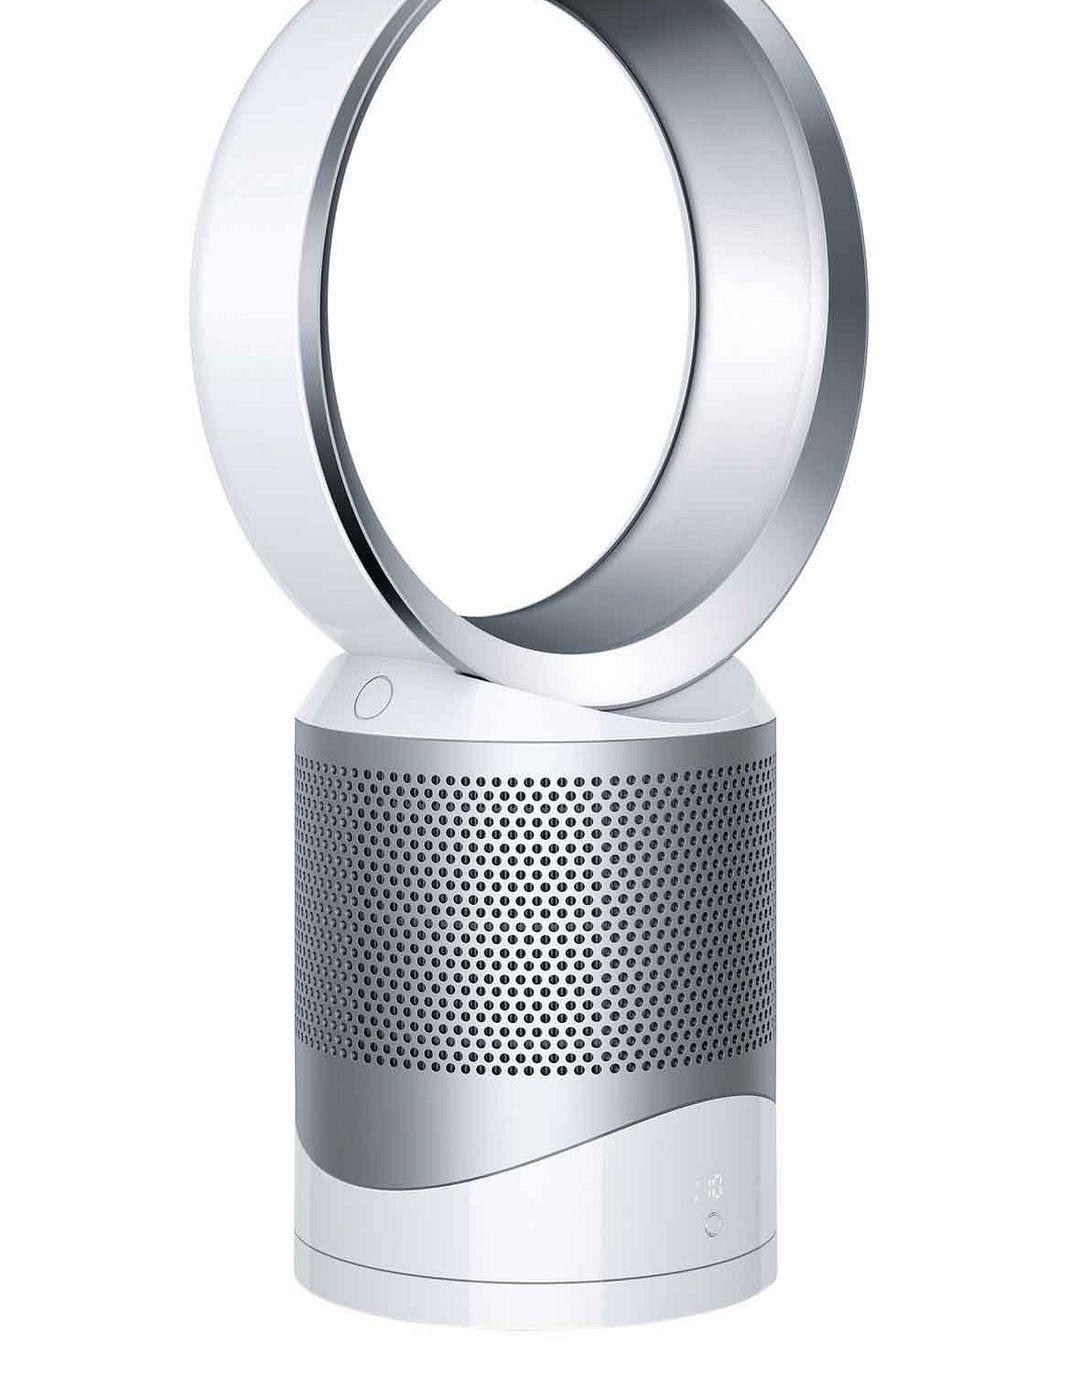 Dyson Pure Cool Link Desk Fan White Silver 308037 01